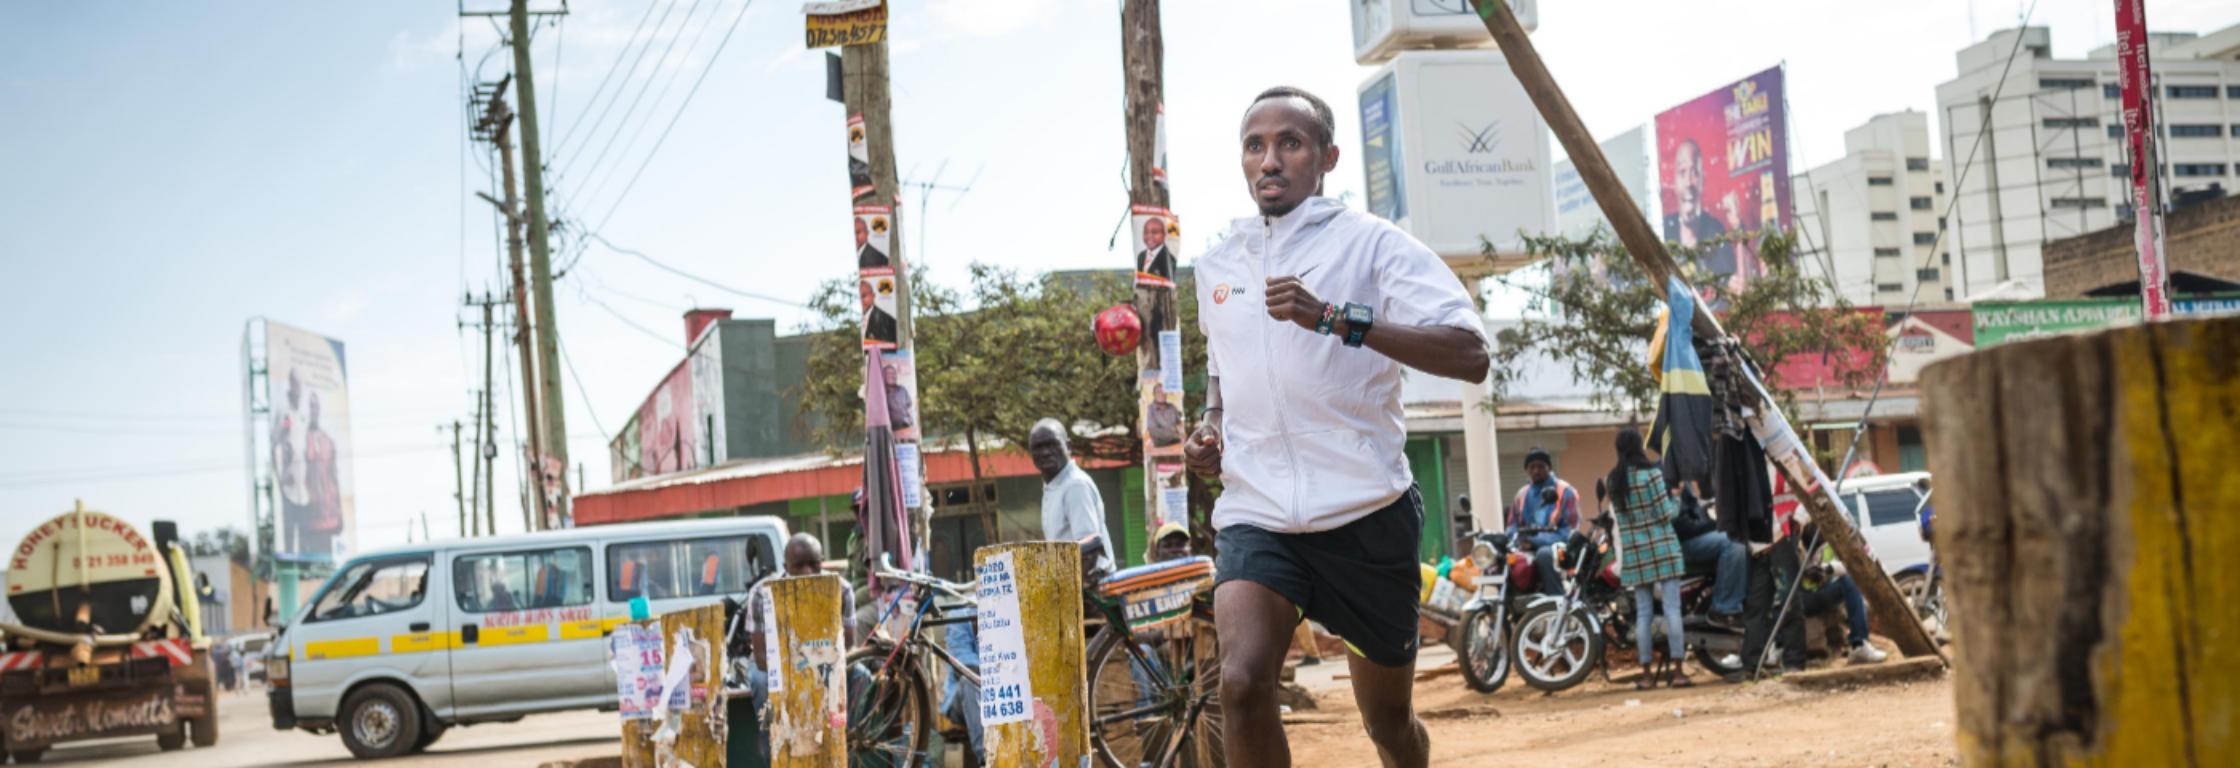 Abdi Nageeye over records, doen en focus